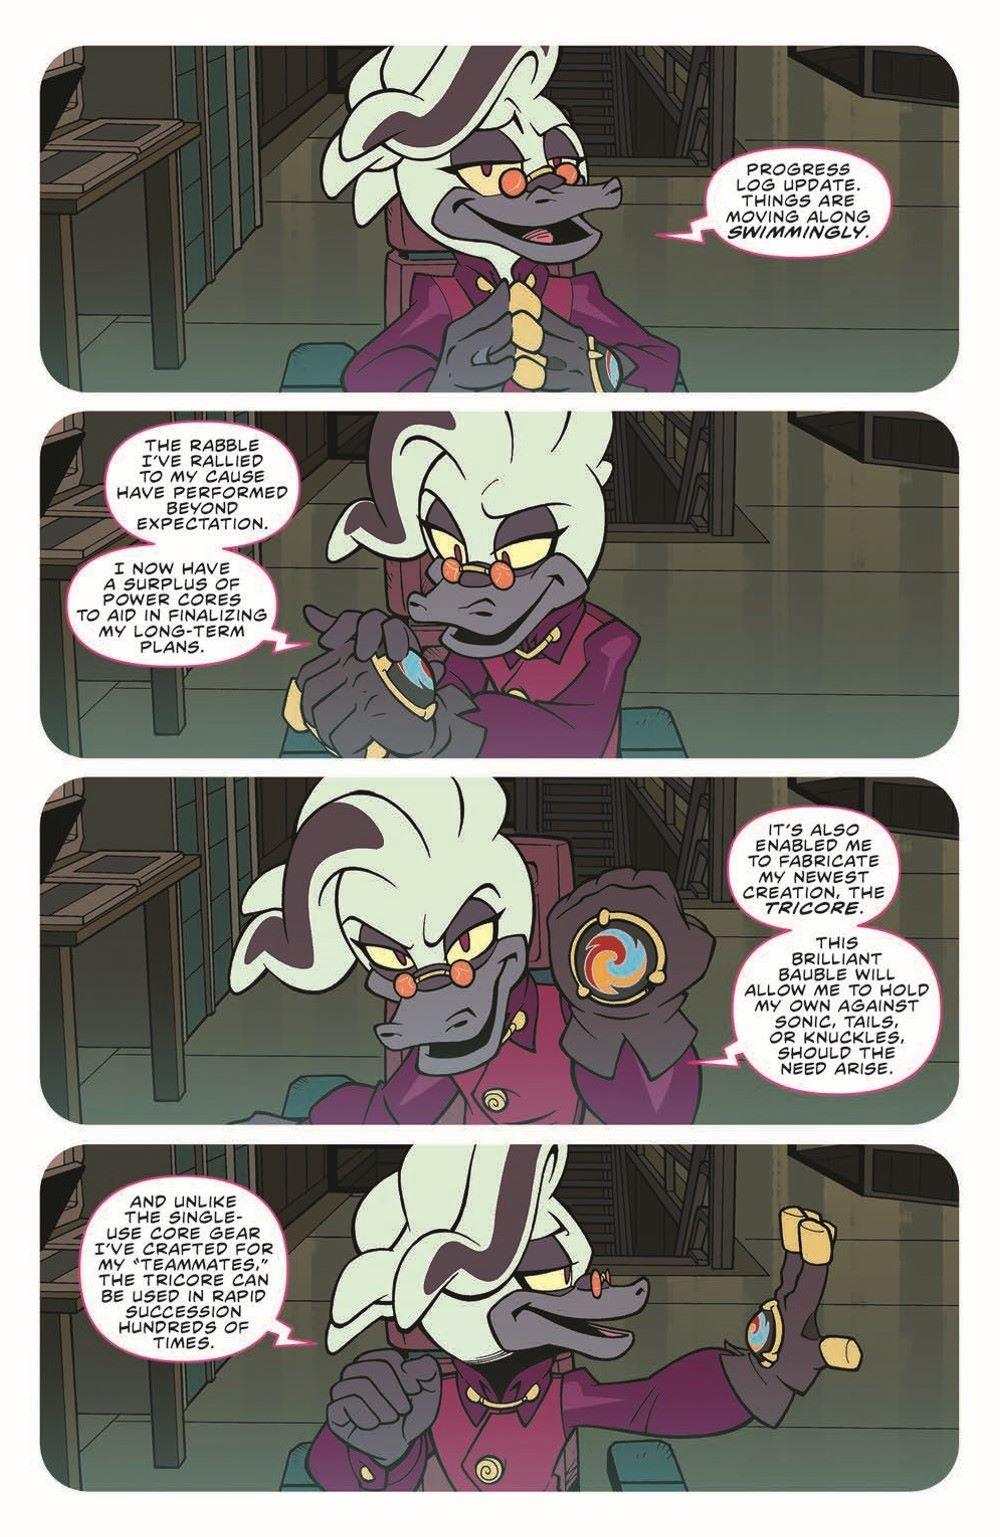 STH-BG03_pr-4 ComicList Previews: SONIC THE HEDGEHOG BAD GUYS #3 (OF 4)